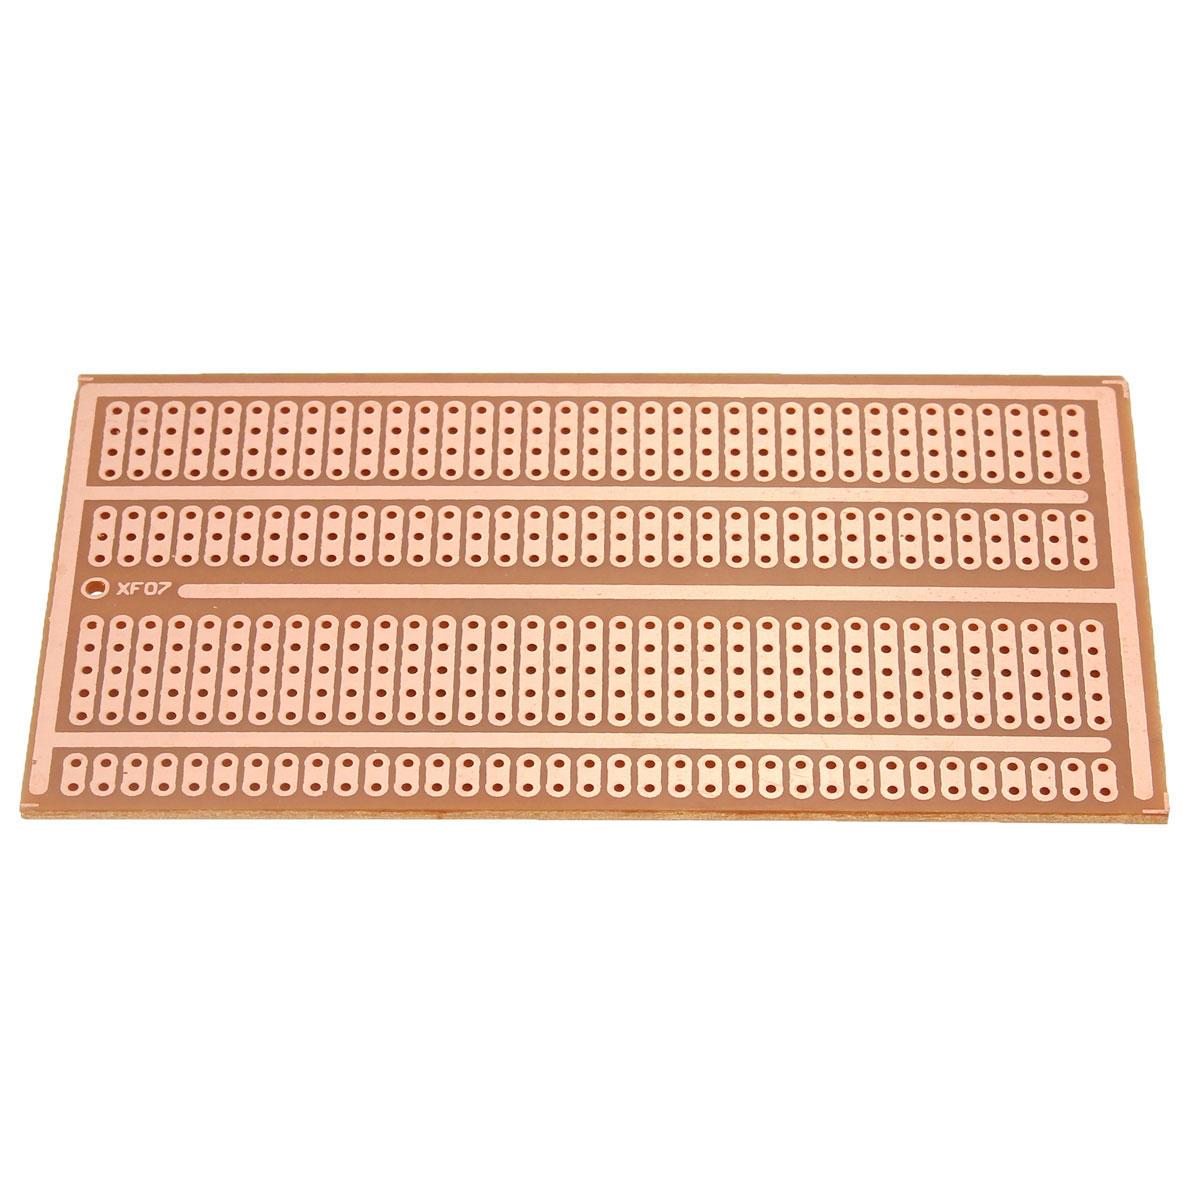 20pcs 5X10cm Single Side Copper Prototype Paper PCB Breadboard 2-3-5 Joint Hole